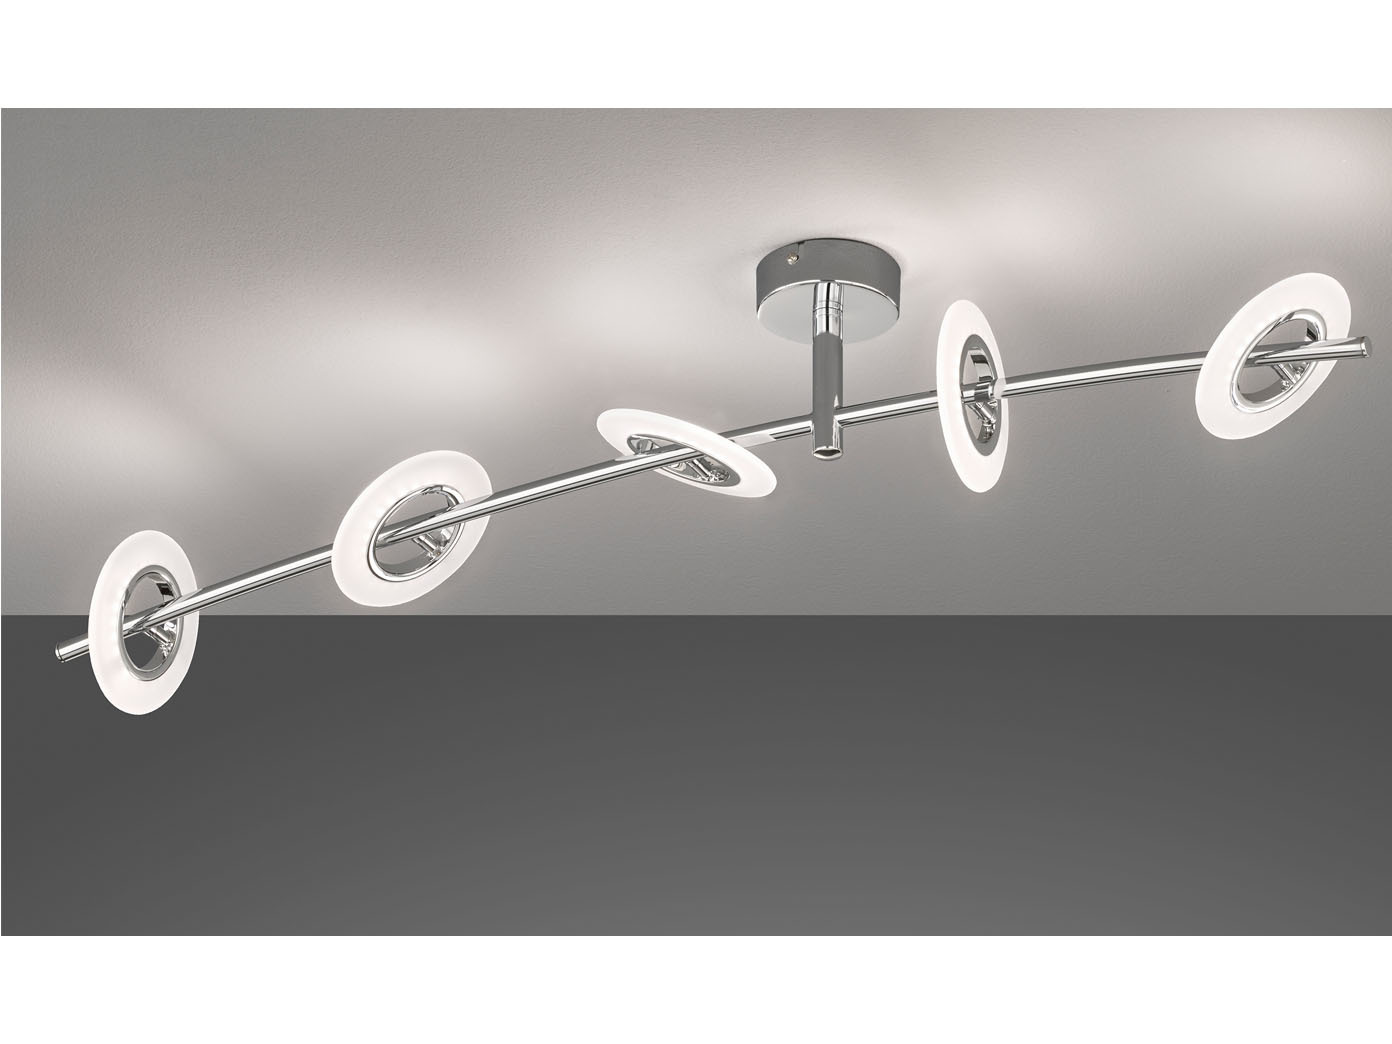 Dimmbare LED Deckenleuchte BAMBUS 8flammig, Metall chrom, Wohnzimmerlampe  Design